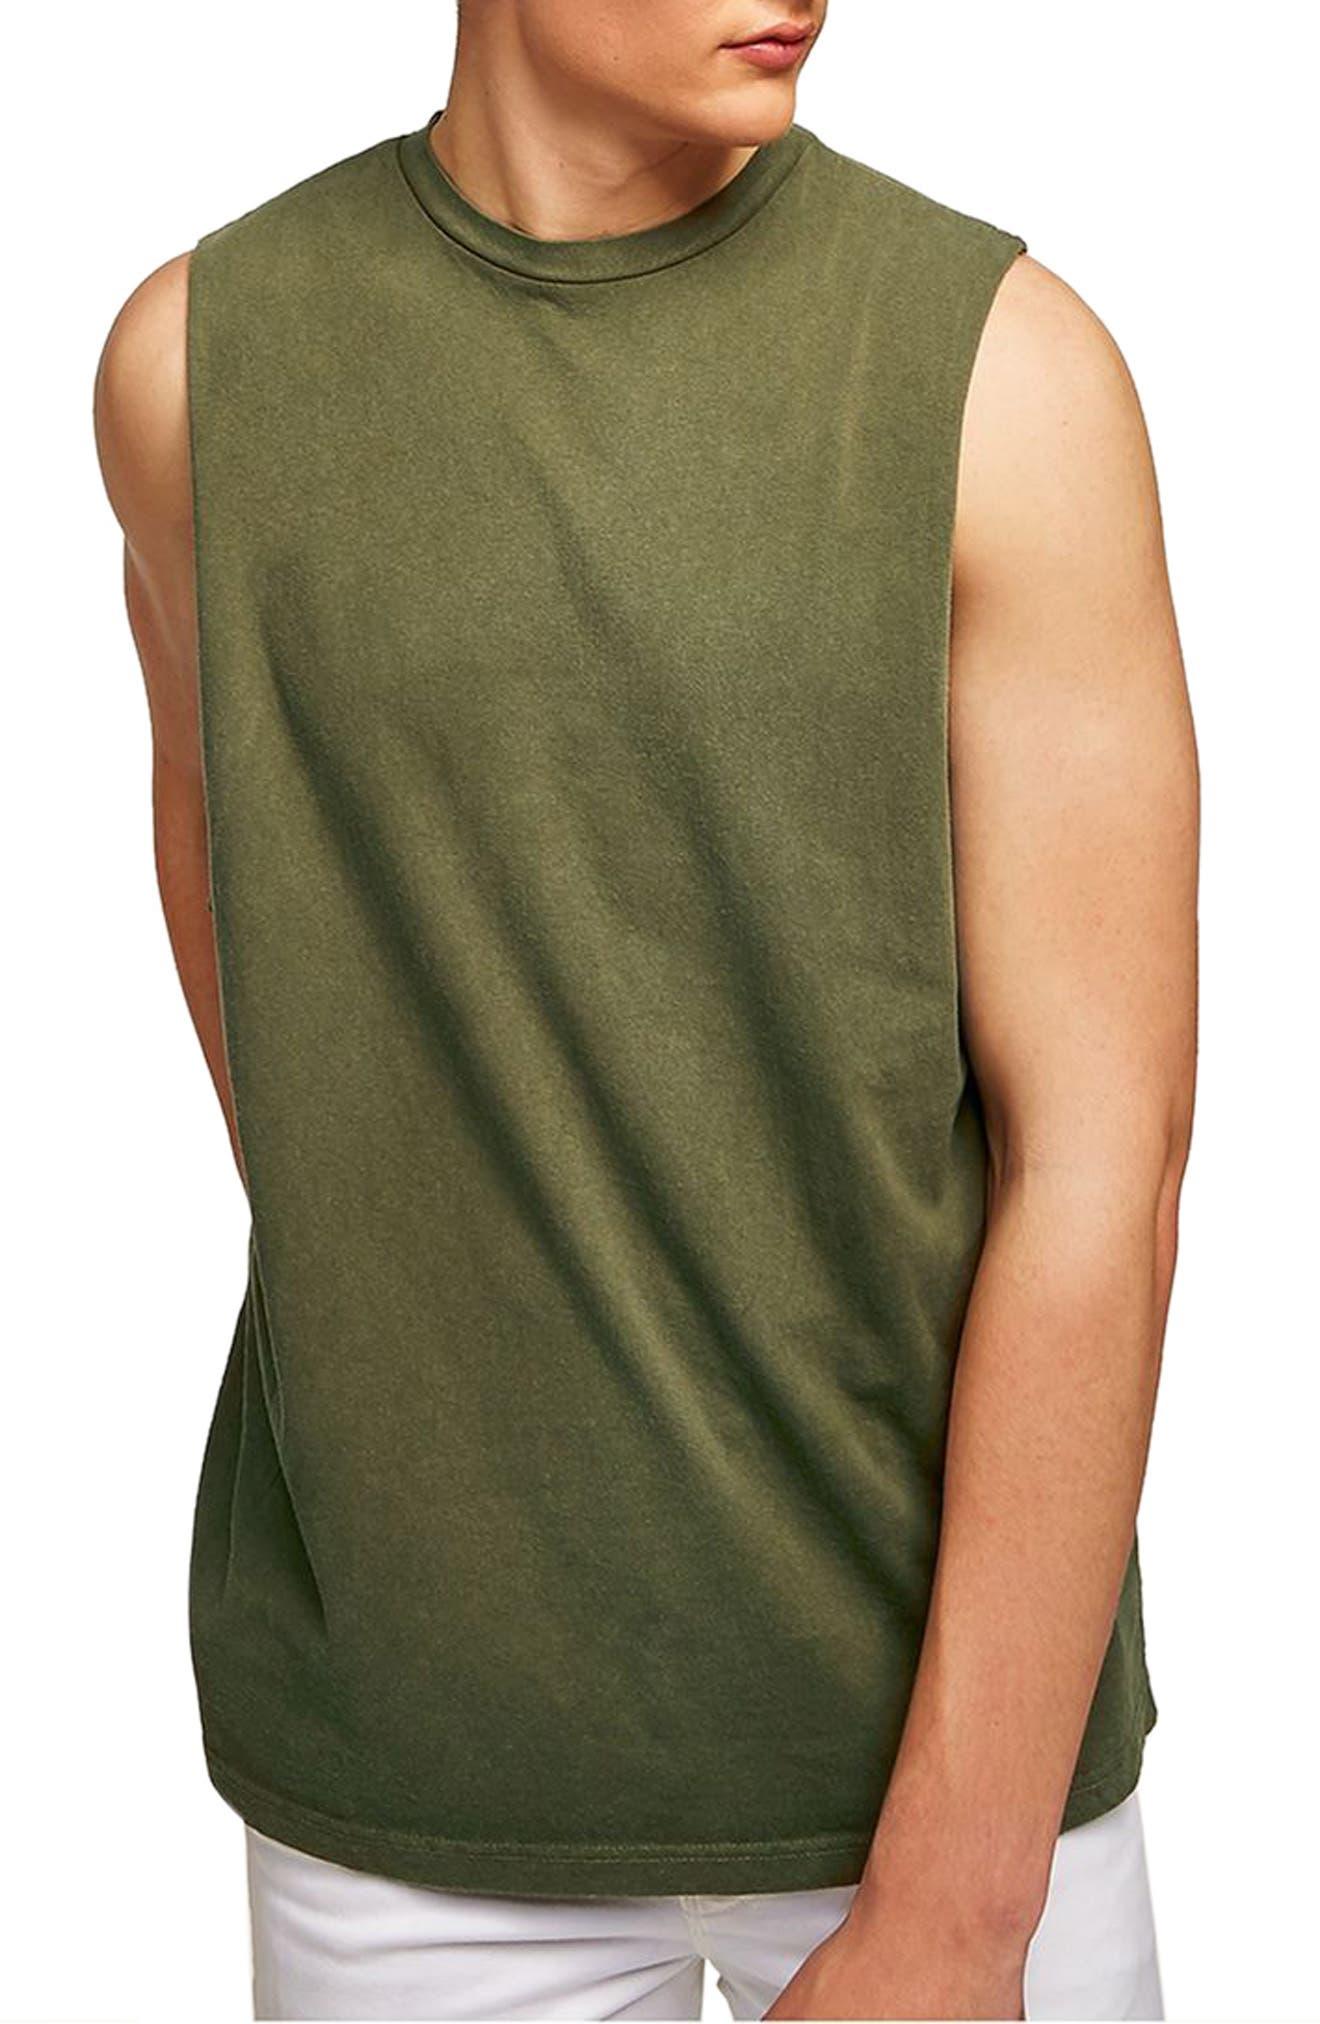 489e542645ec9 Topman Drop Shoulder Tank In Dark Olive